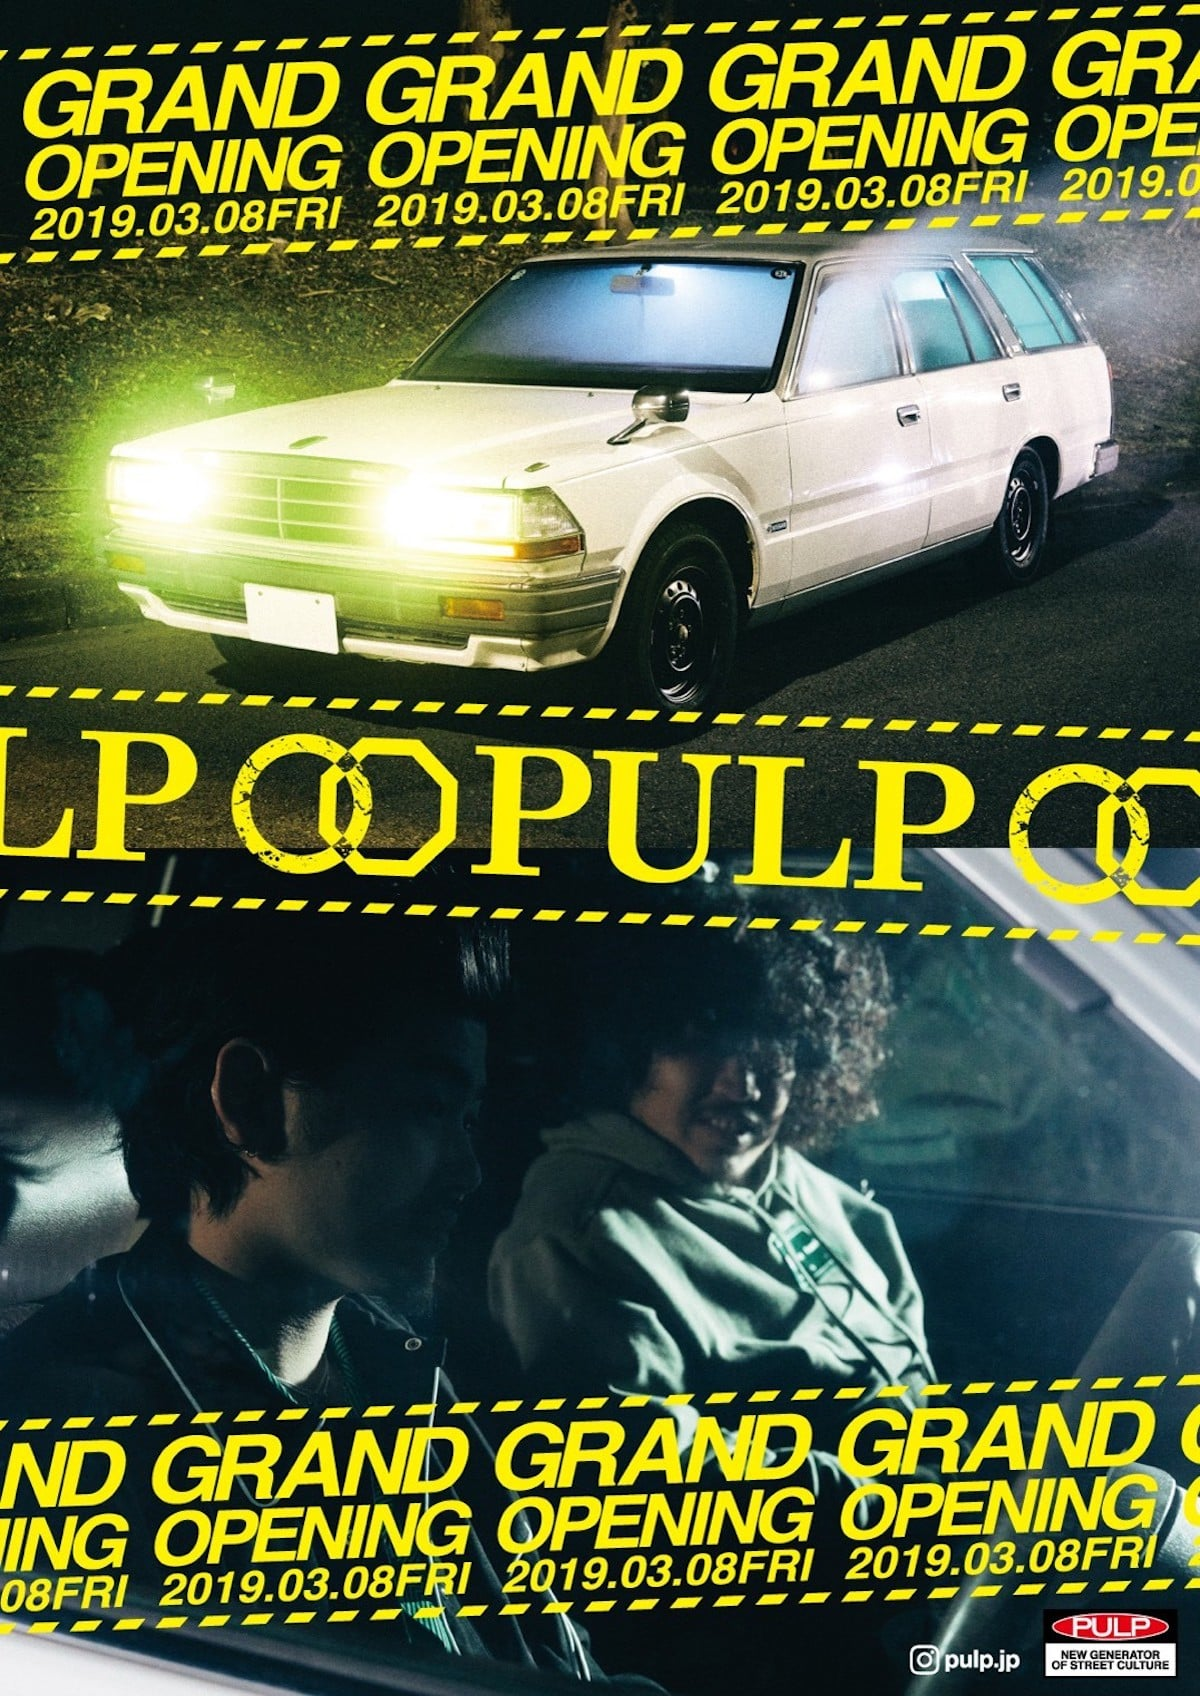 PULPがリニューアルオープンし、YouthQuakeのPOPUPが開催|2019SS Lookも公開 life-fashion190304-pulp-youthquake-12-1200x1696